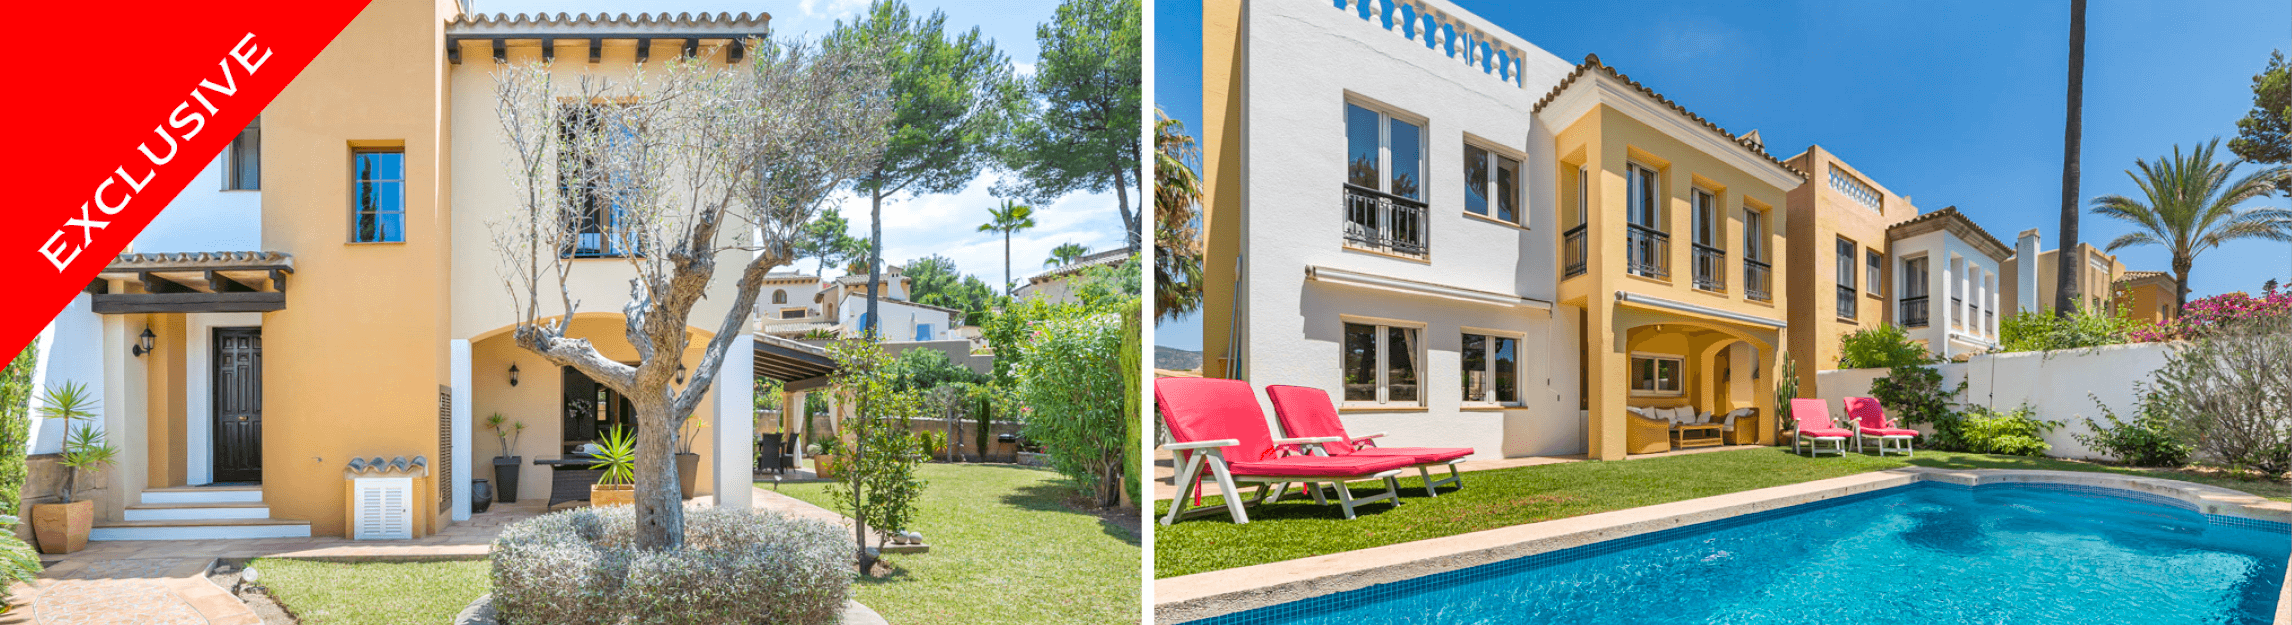 Properties under 800K5 - Santa Ponsa